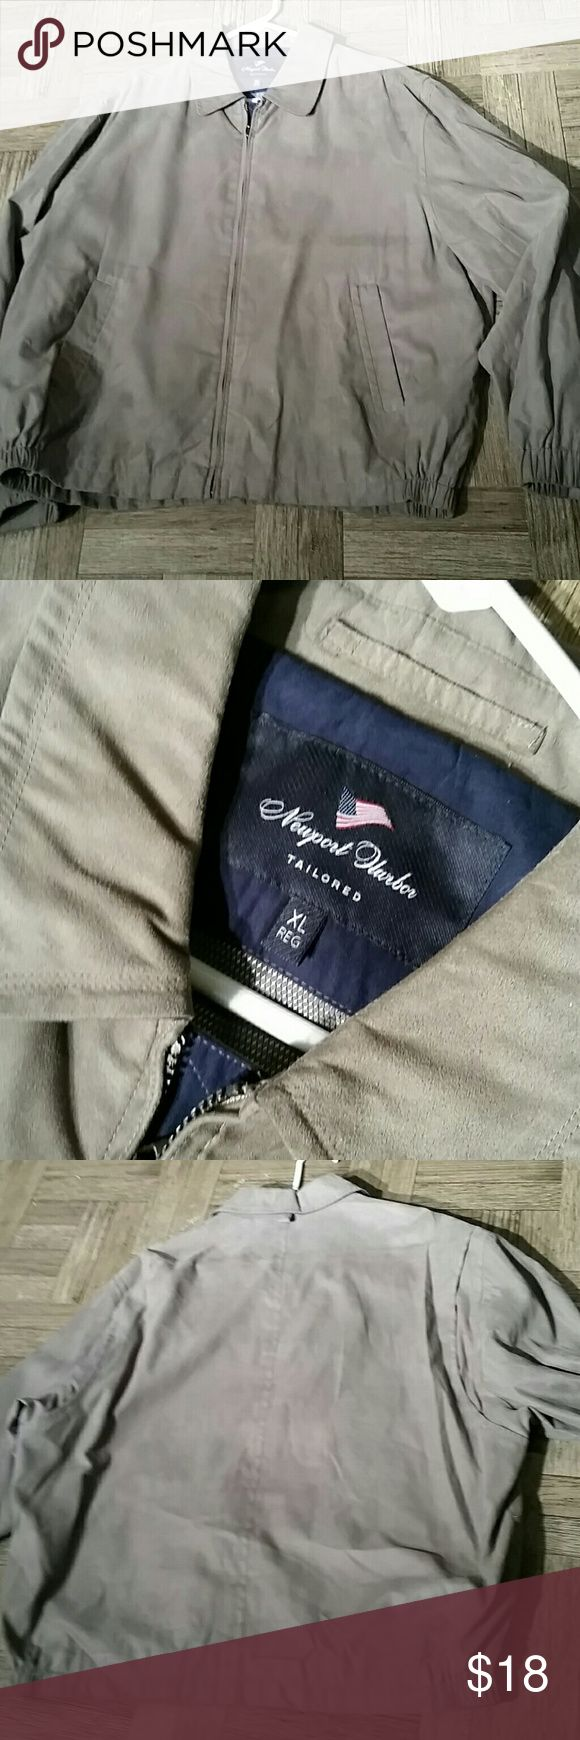 Men Light Jacket  Size XL Reg by NEWPORT  HARBOR Excellent condition -Might be NEW!!! Newport Harbor Jackets & Coats Lightweight & Shirt Jackets